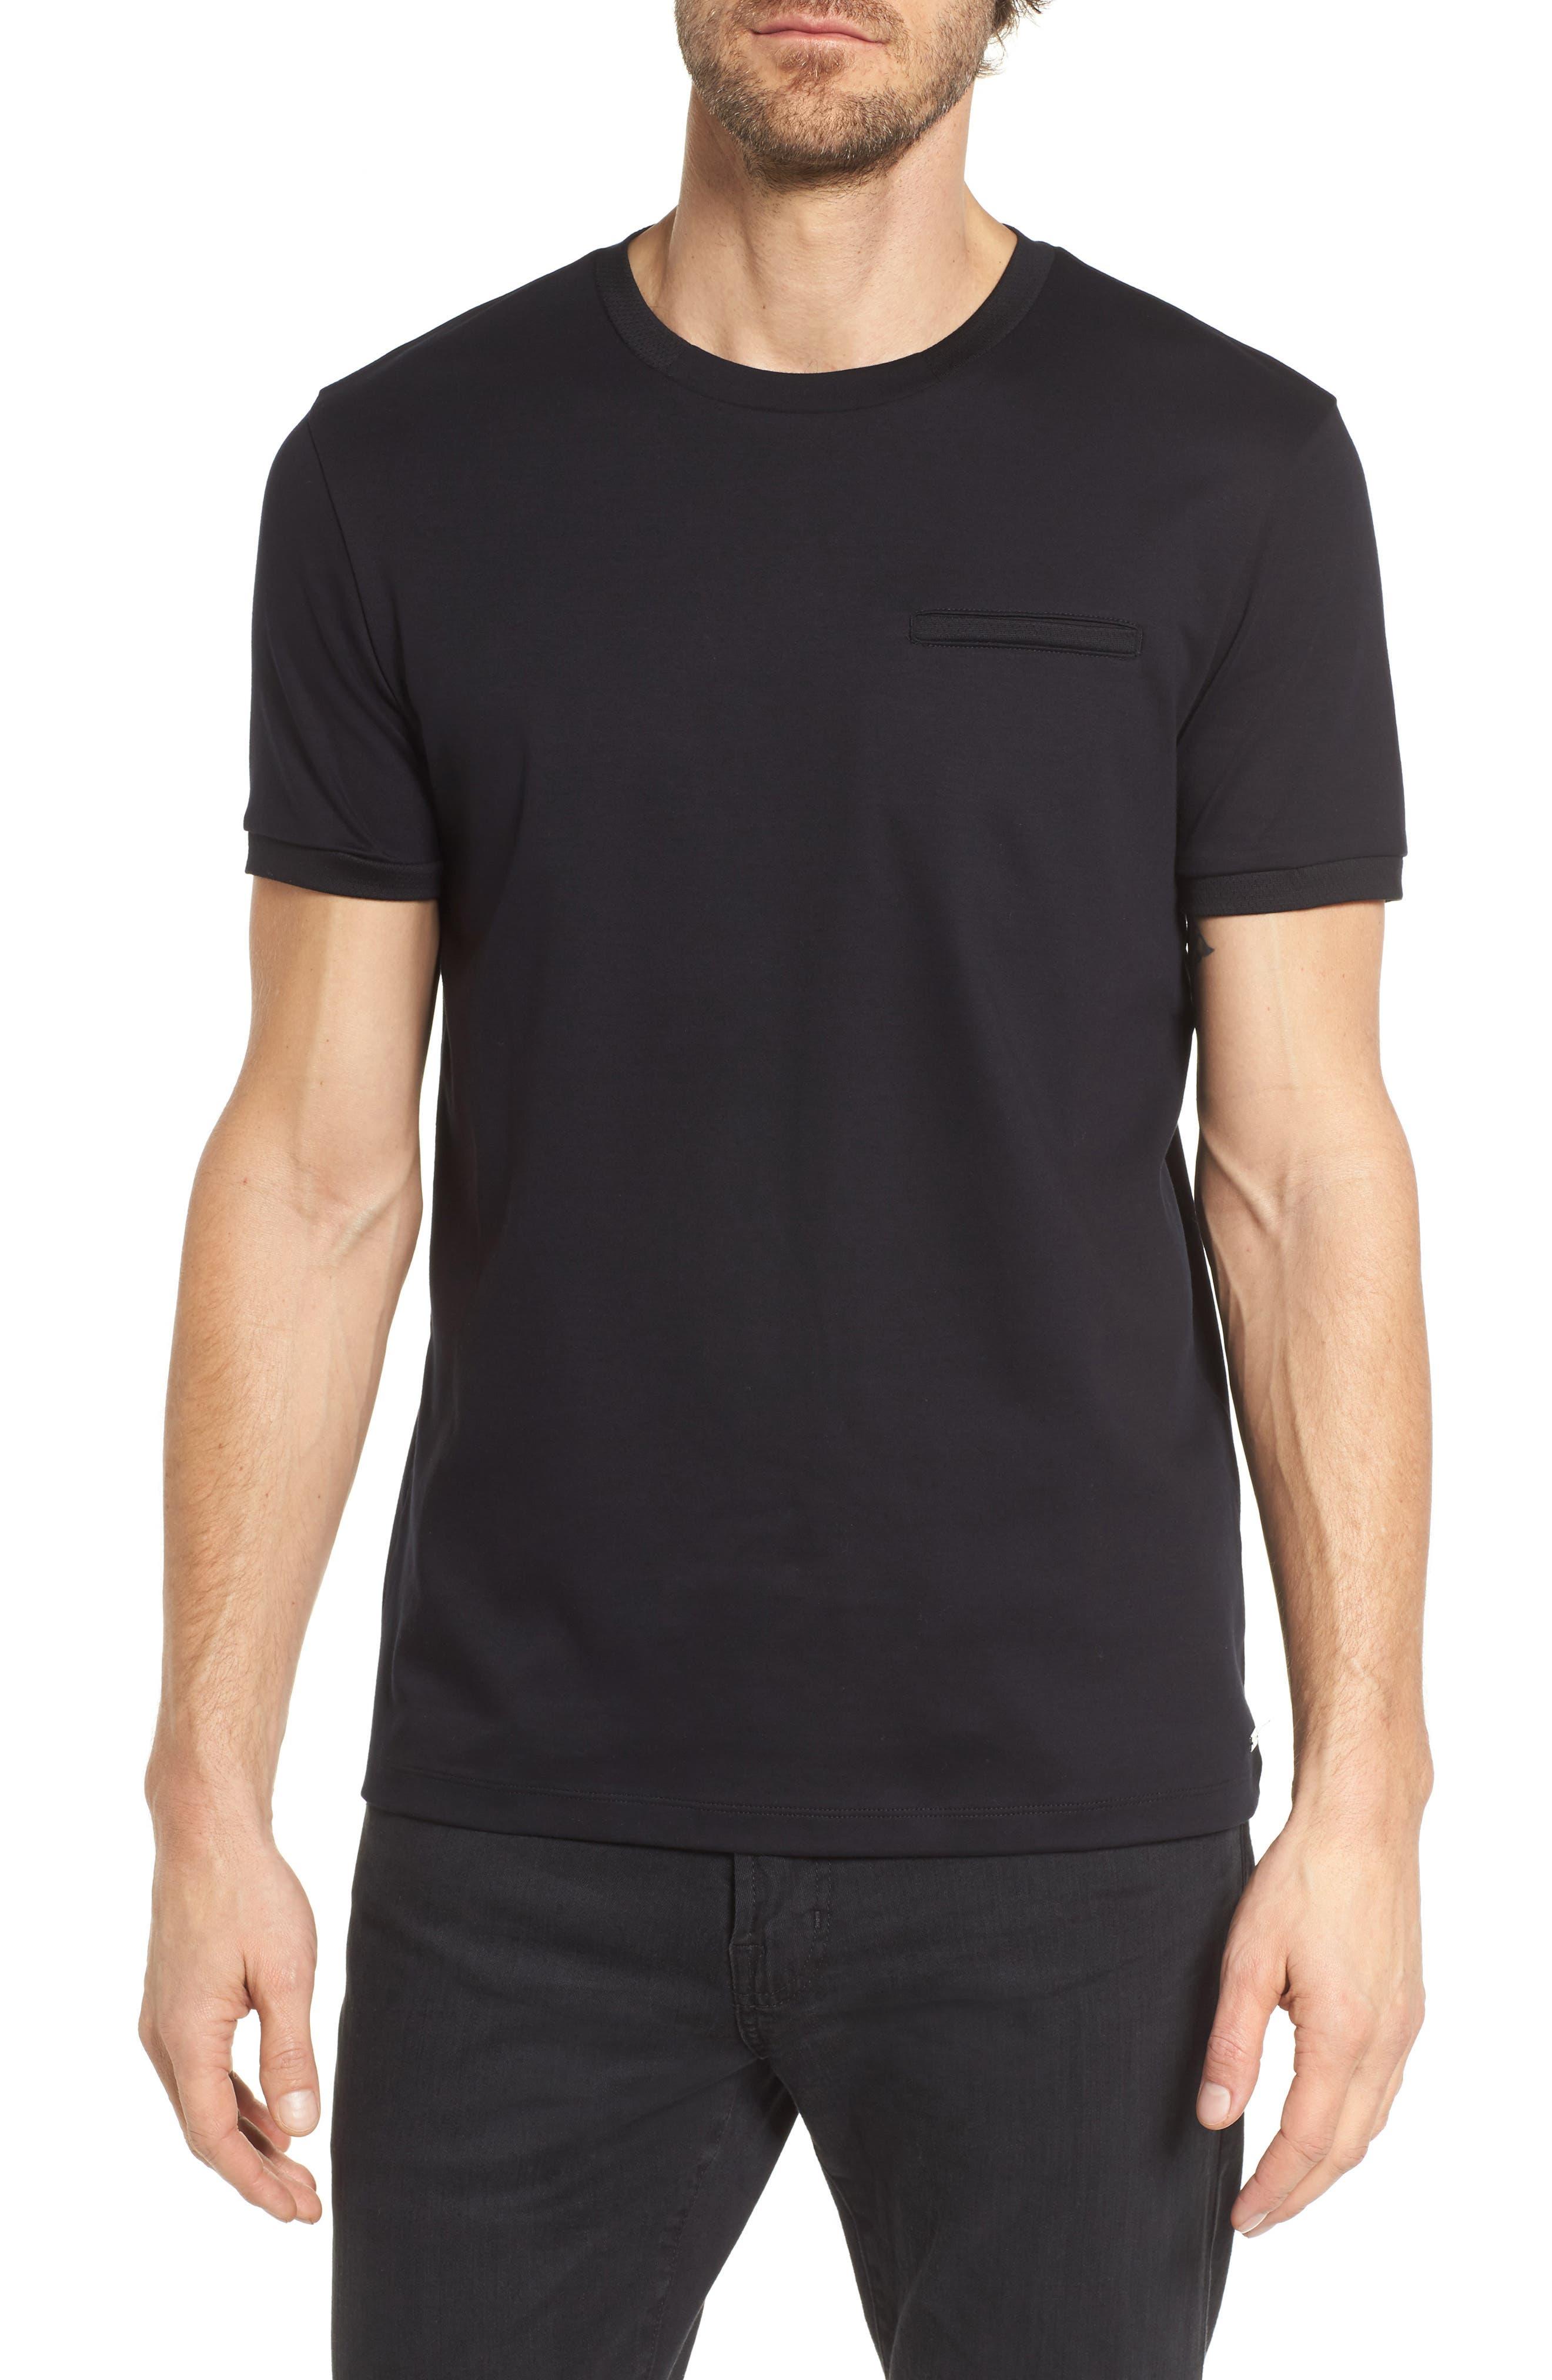 Tessler Mercedes Slim Fit Crewneck T-Shirt,                             Main thumbnail 1, color,                             001